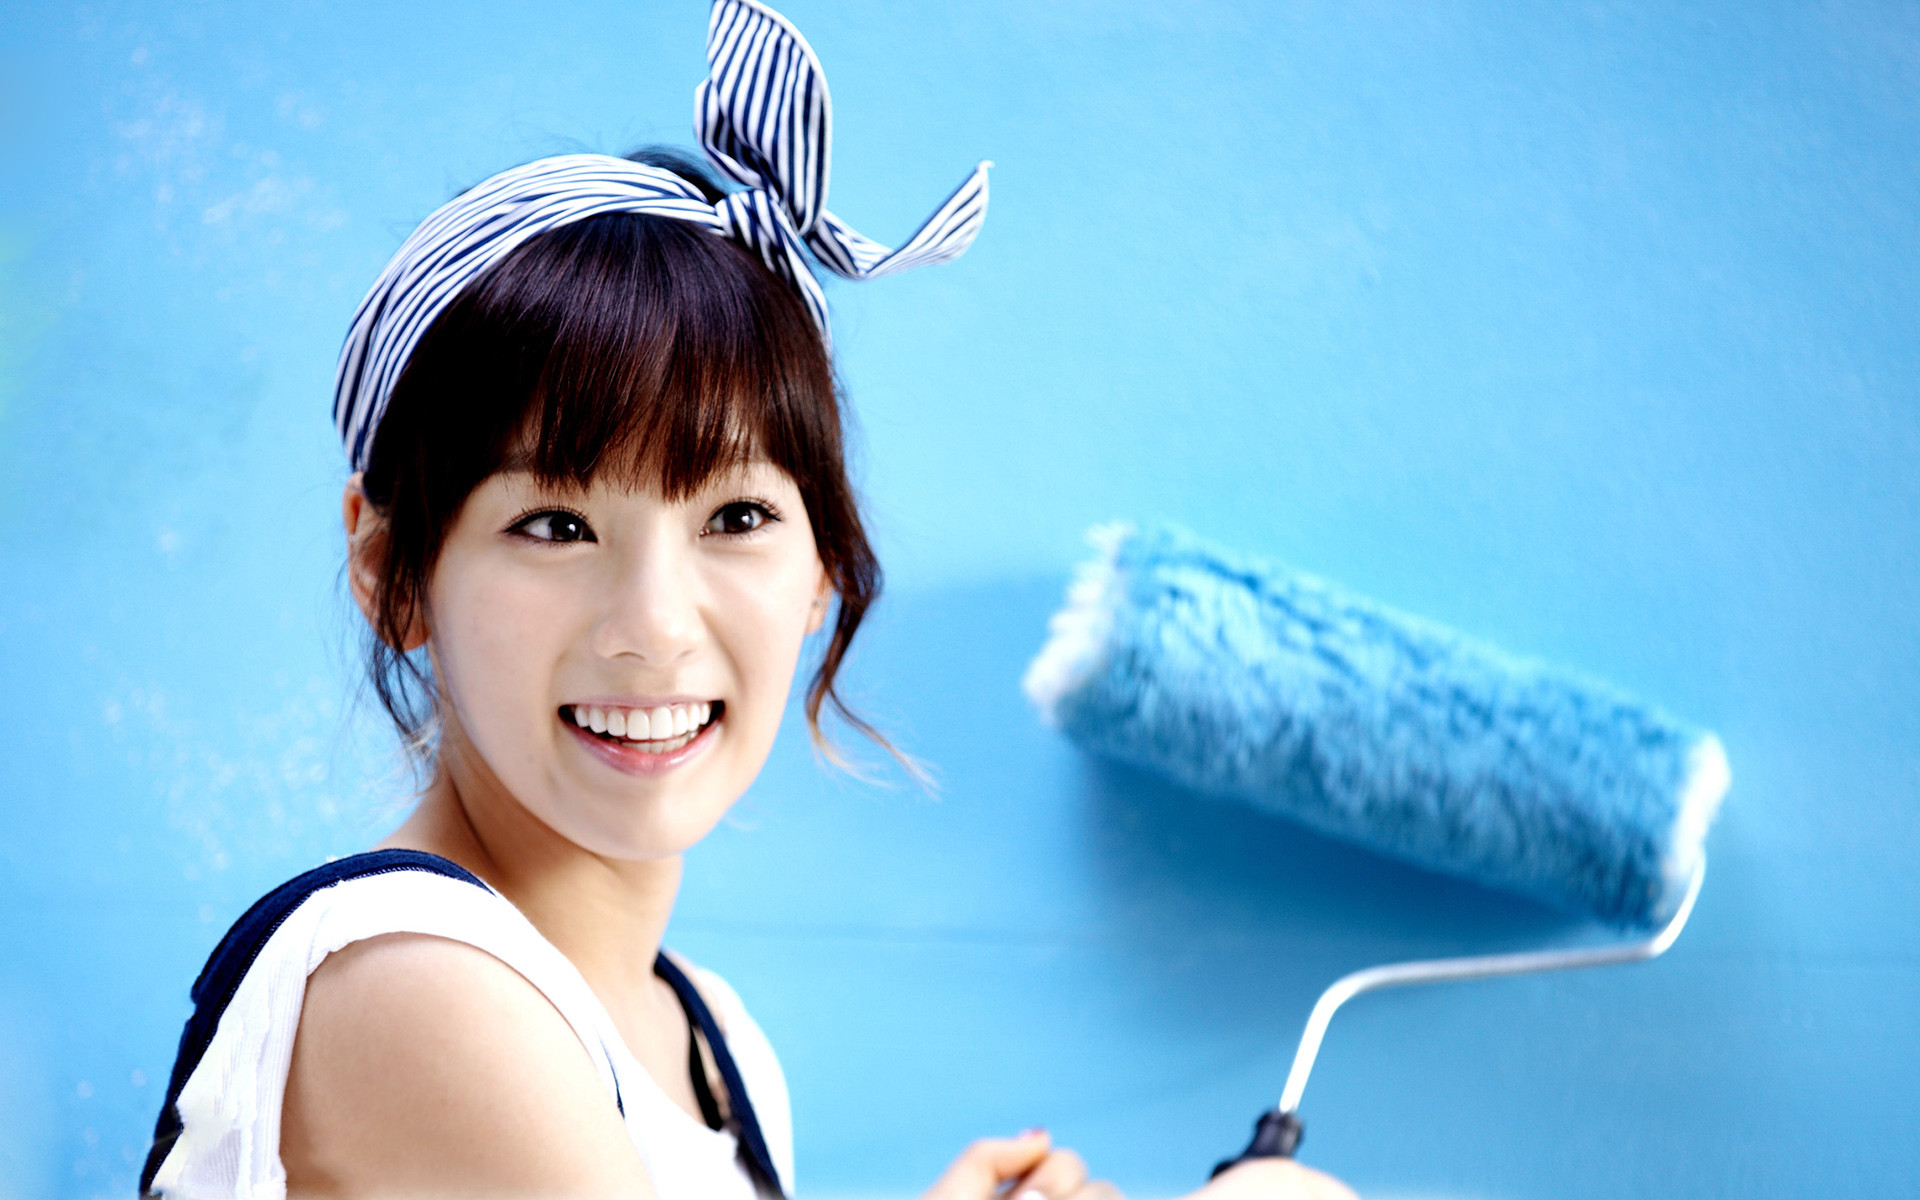 Cute Korean Backgrounds 183 ① Wallpapertag